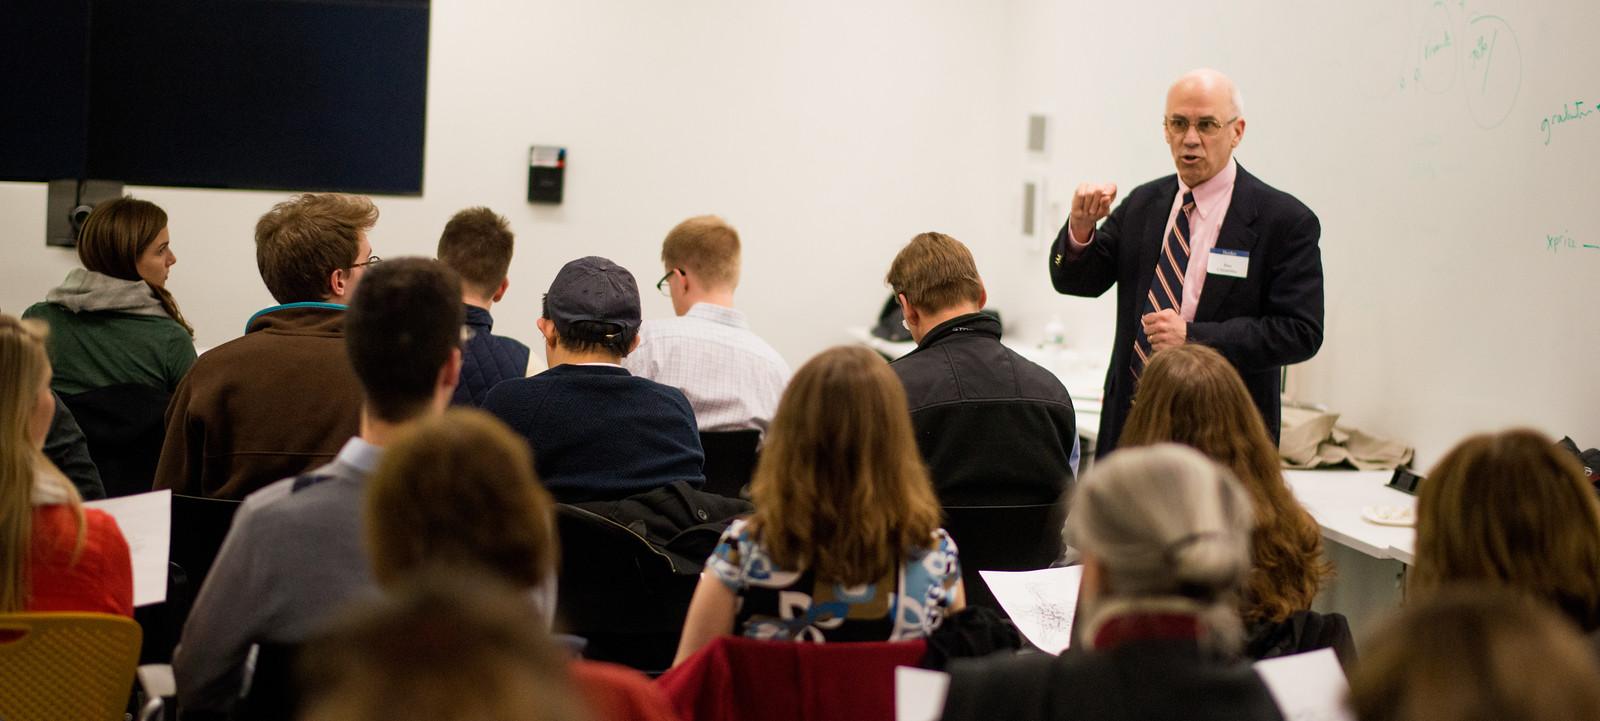 Dan Chambliss discusses <em>How College Works</em> at MIT